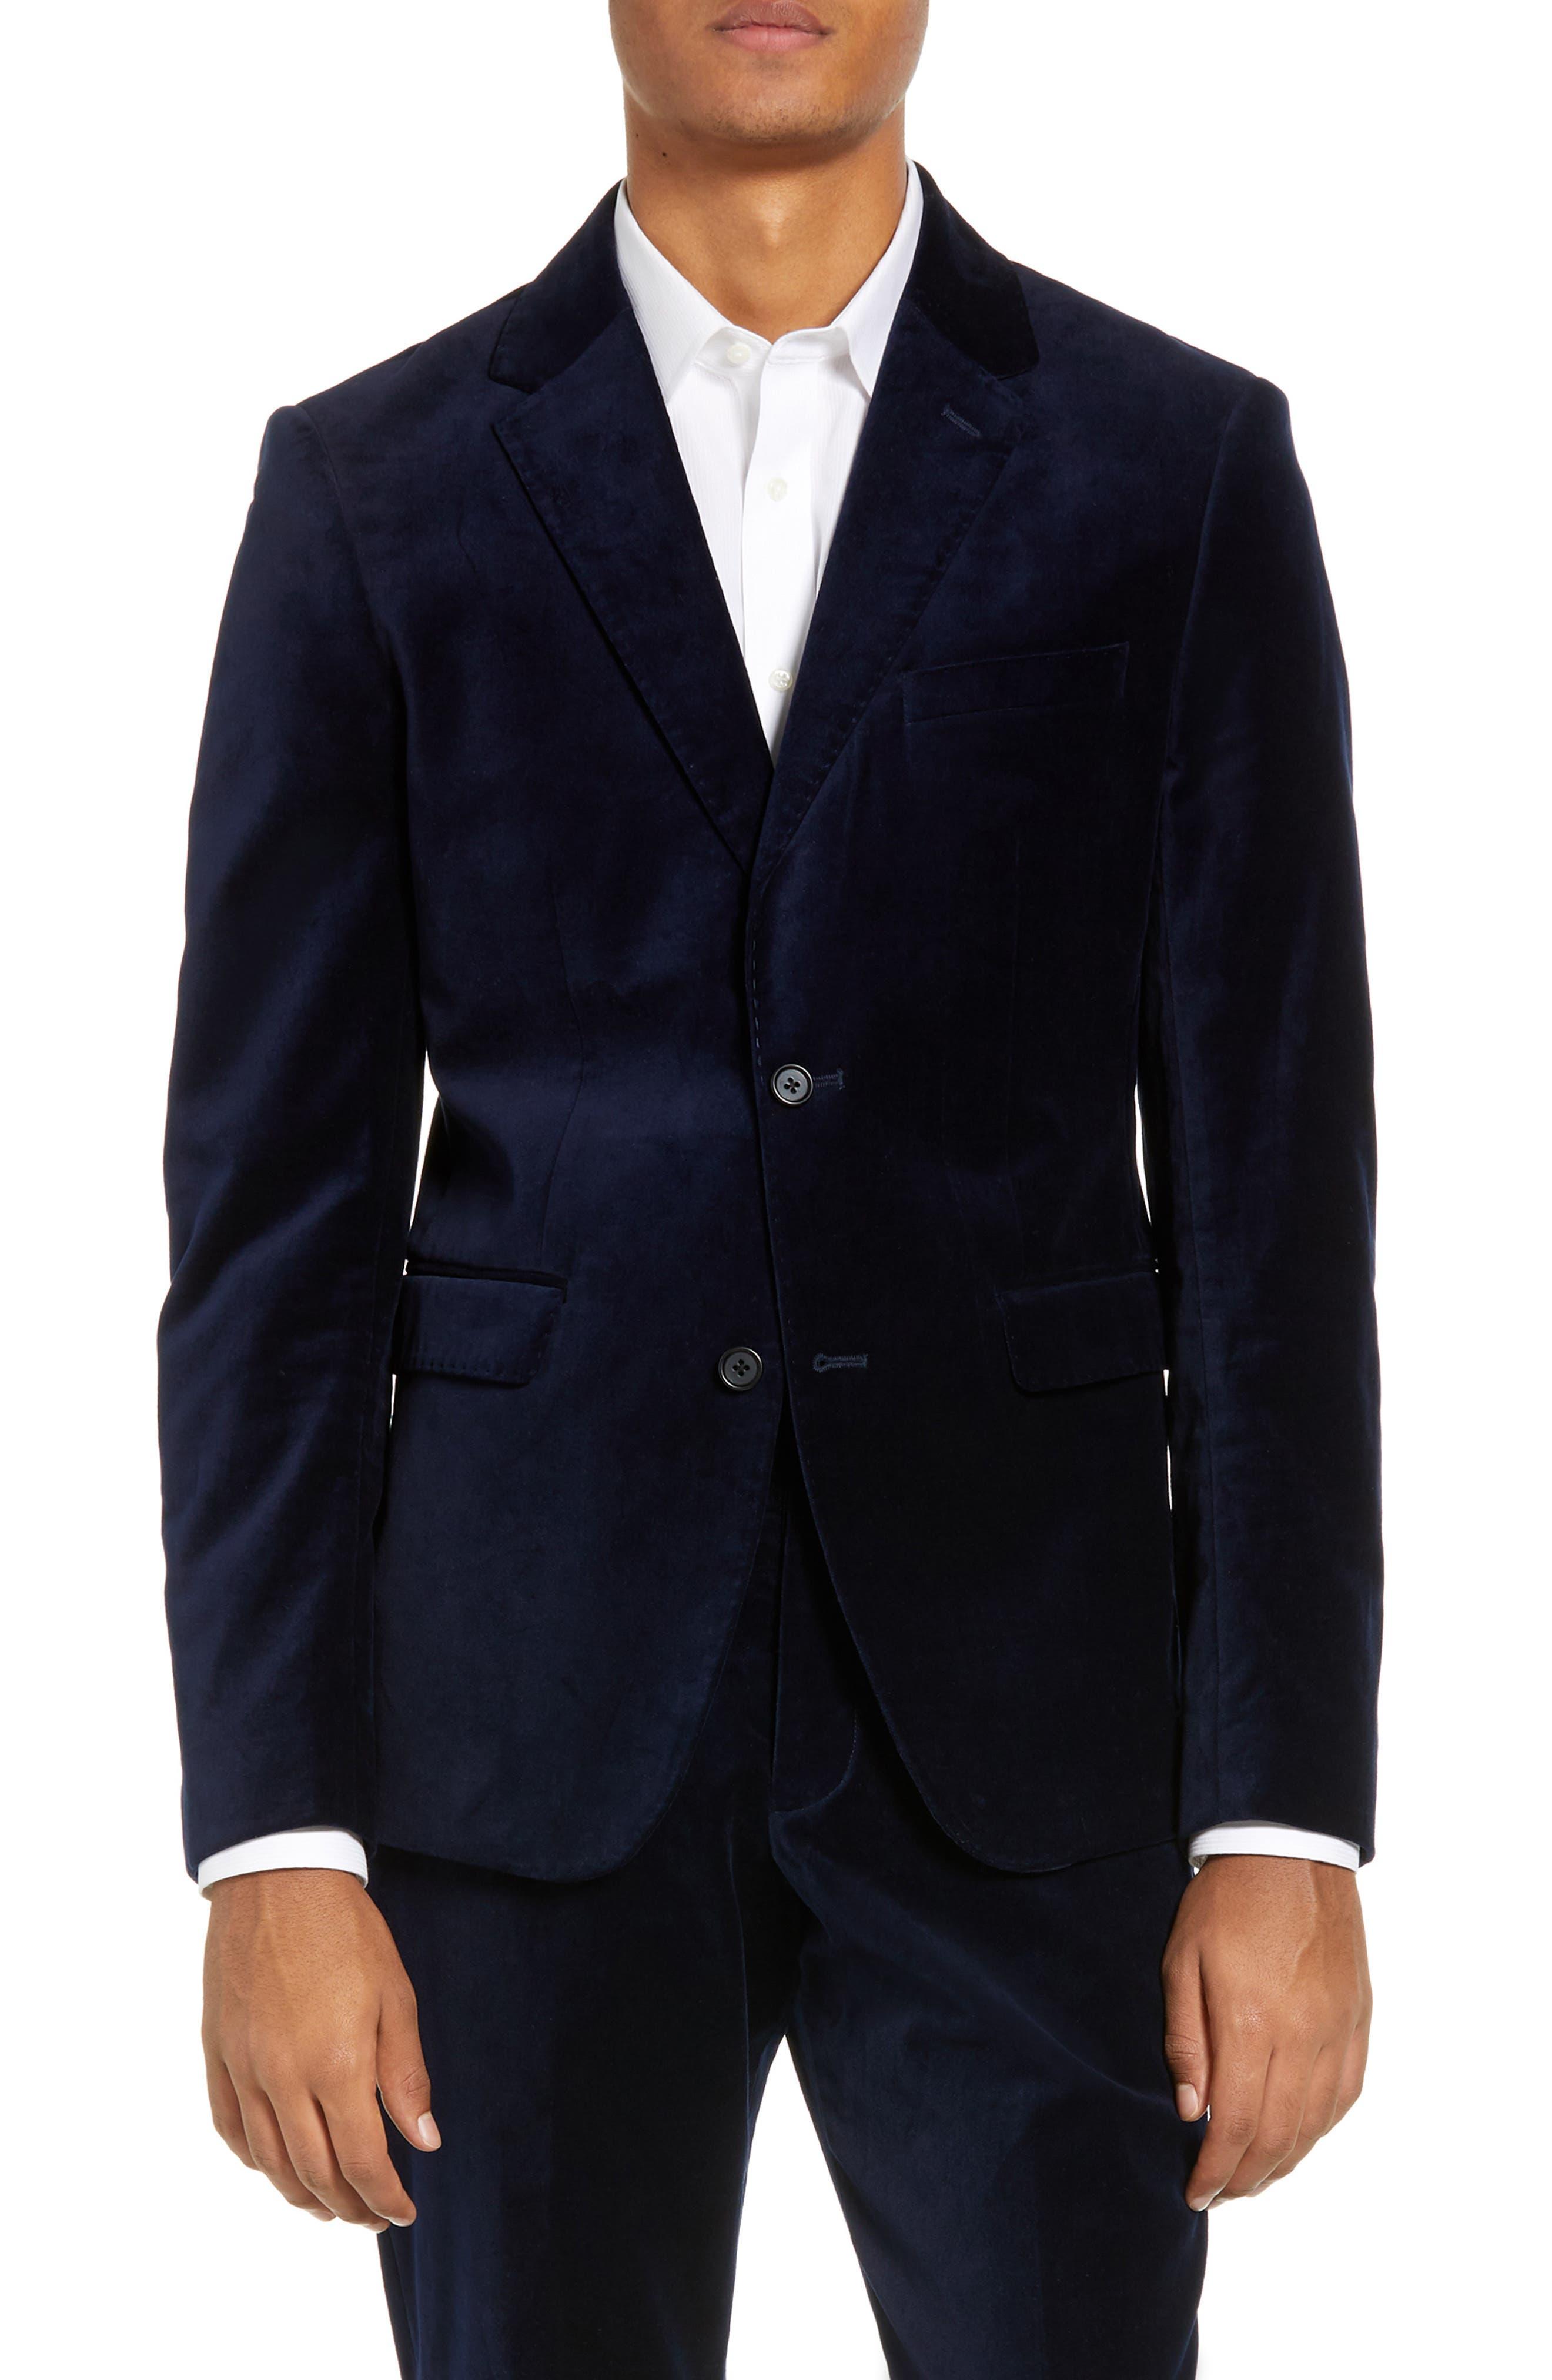 FRENCH CONNECTION,                             Regular Fit Plush Velveteen Blazer,                             Main thumbnail 1, color,                             BLUE BLOOD